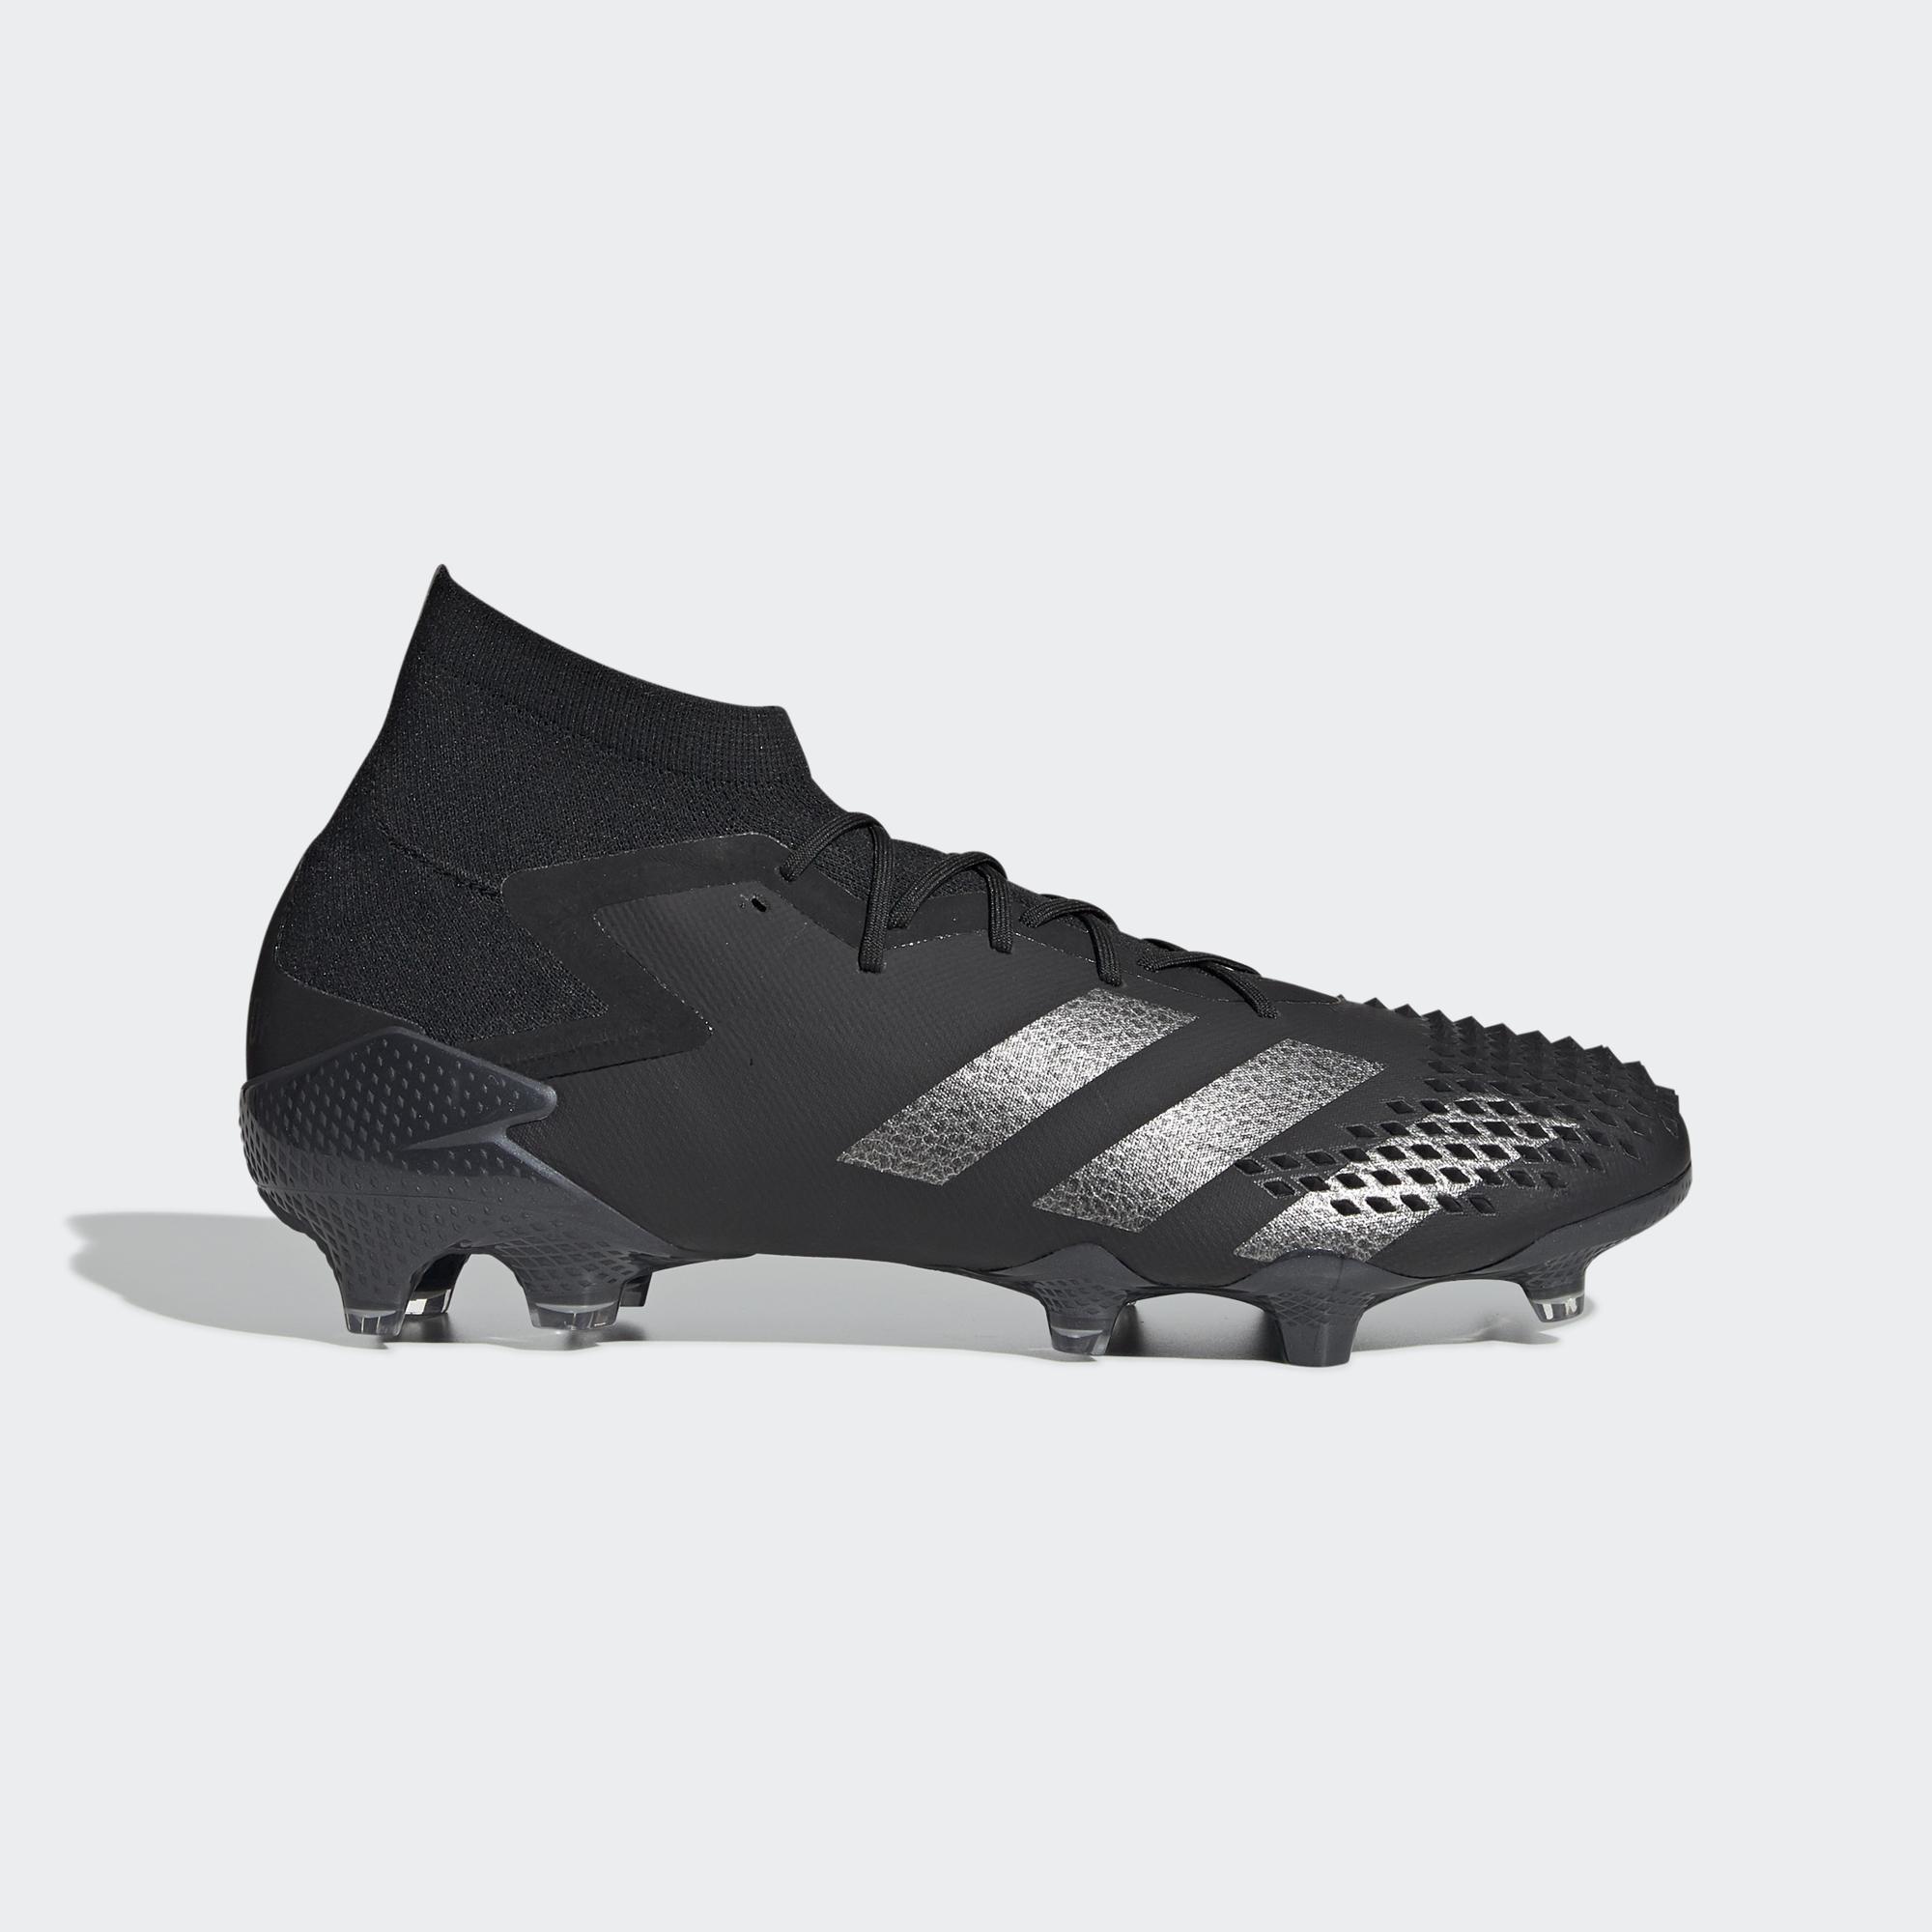 Adidas Scarpe Calcio Predator Mutator 20.1 Fg